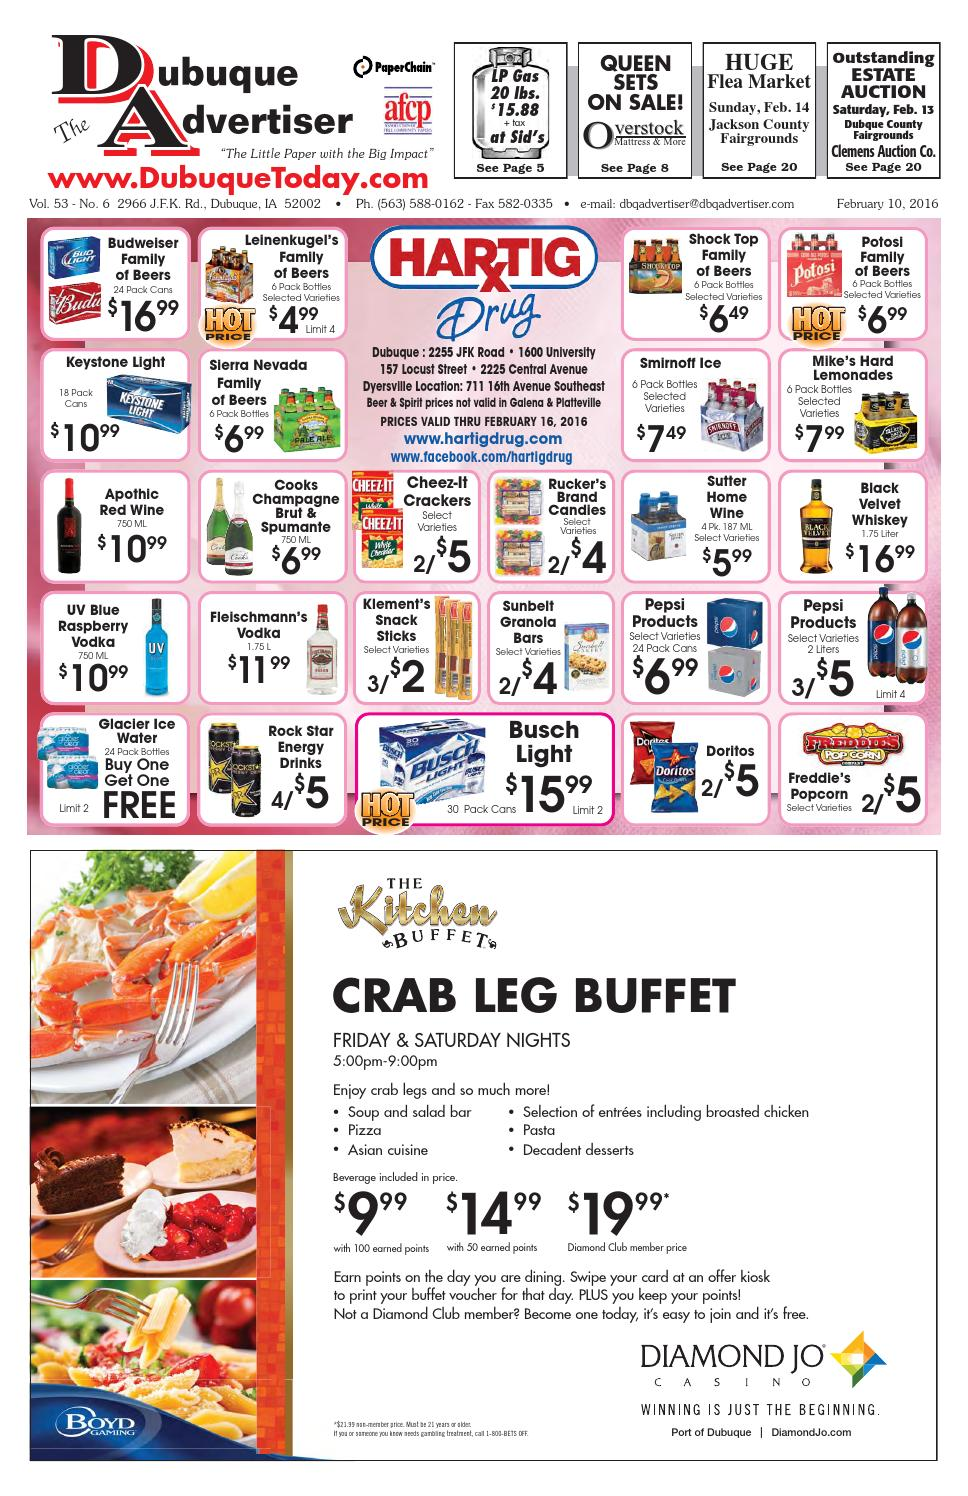 2519f56b600 The Dubuque Advertiser February 10